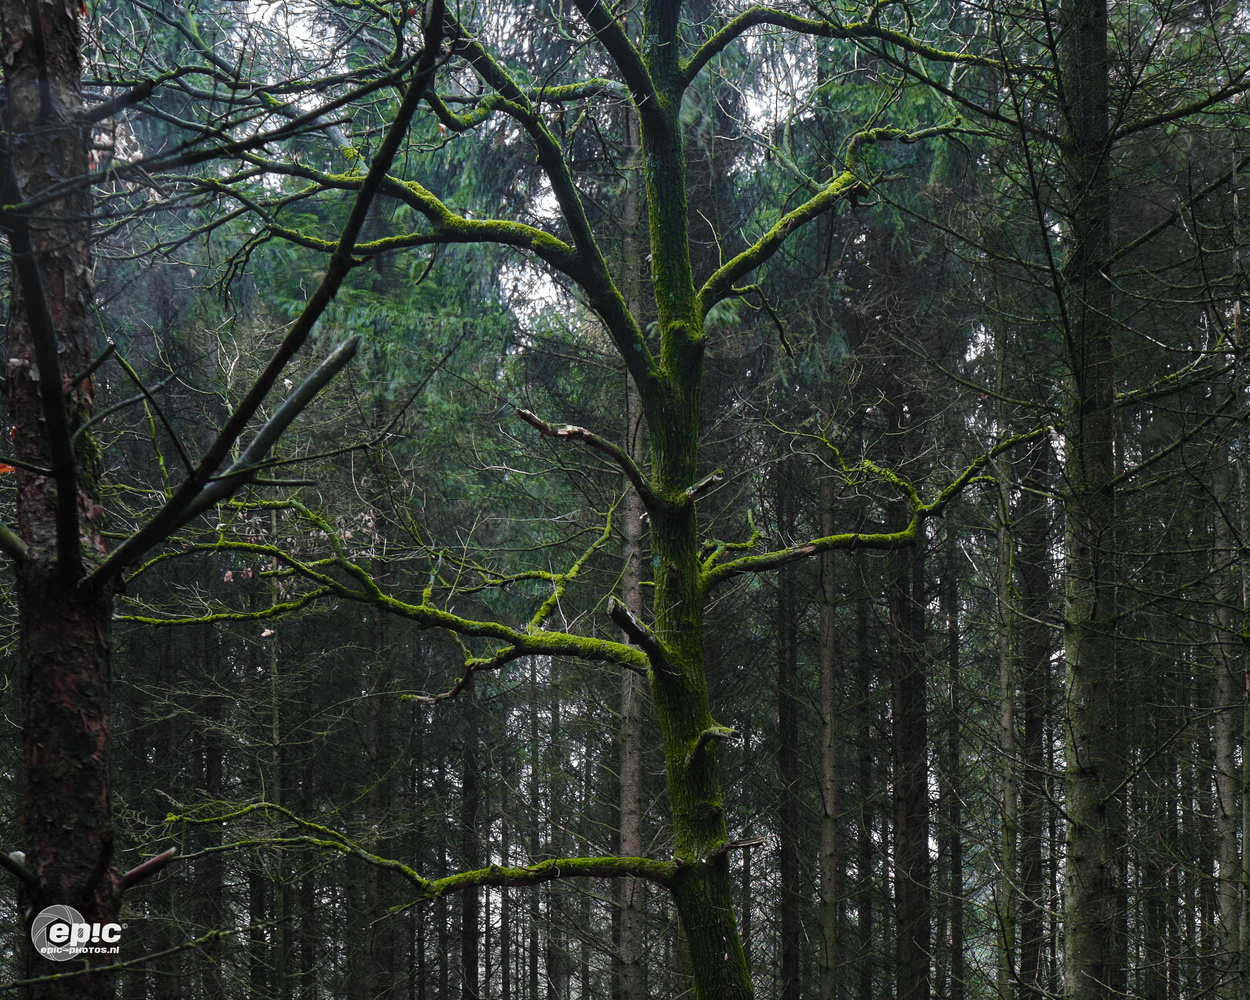 Mossy Tree by Erick Van Rijswick